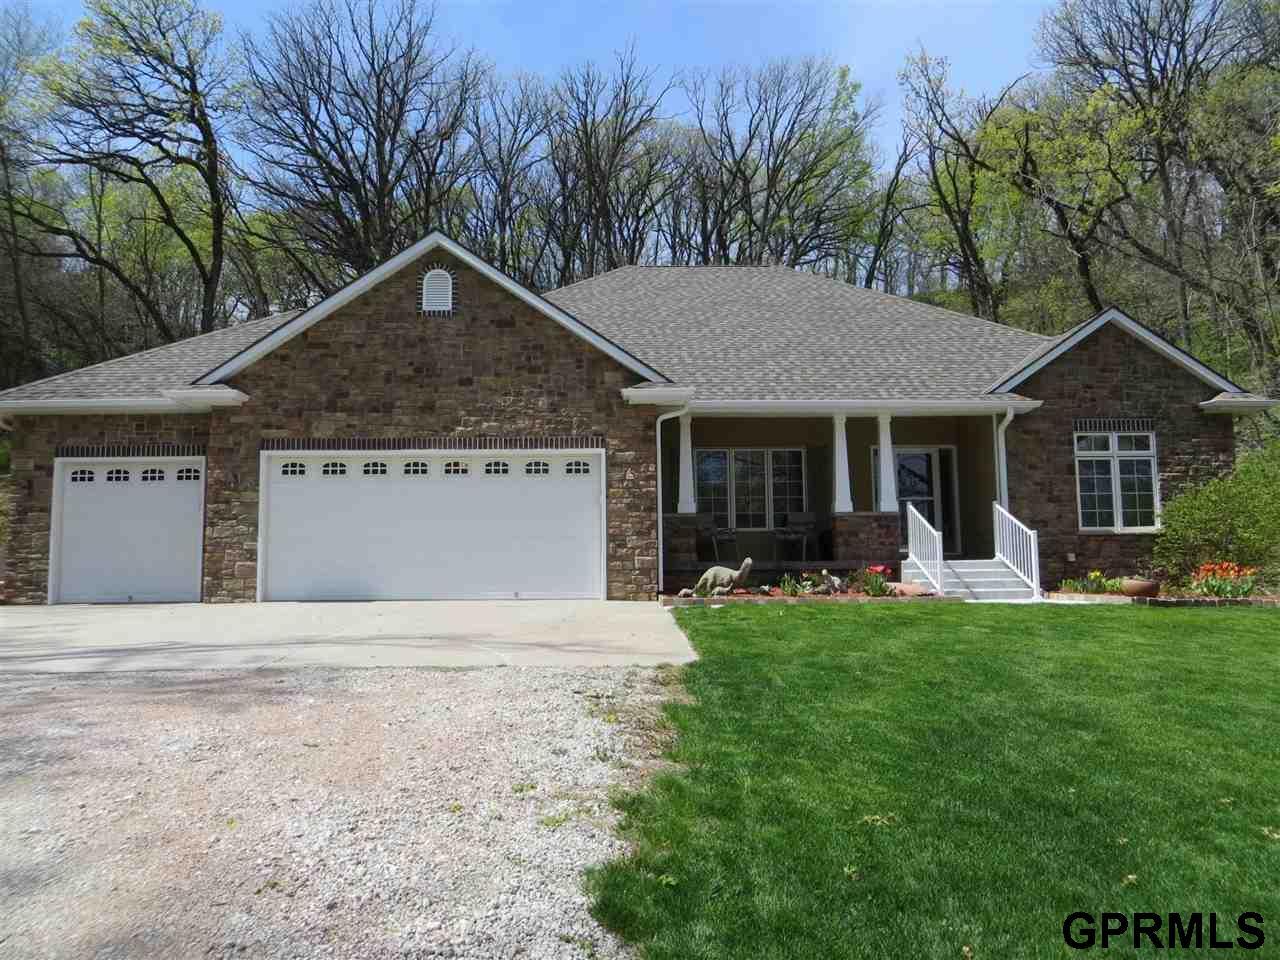 Real Estate for Sale, ListingId: 33536858, Blair,NE68008